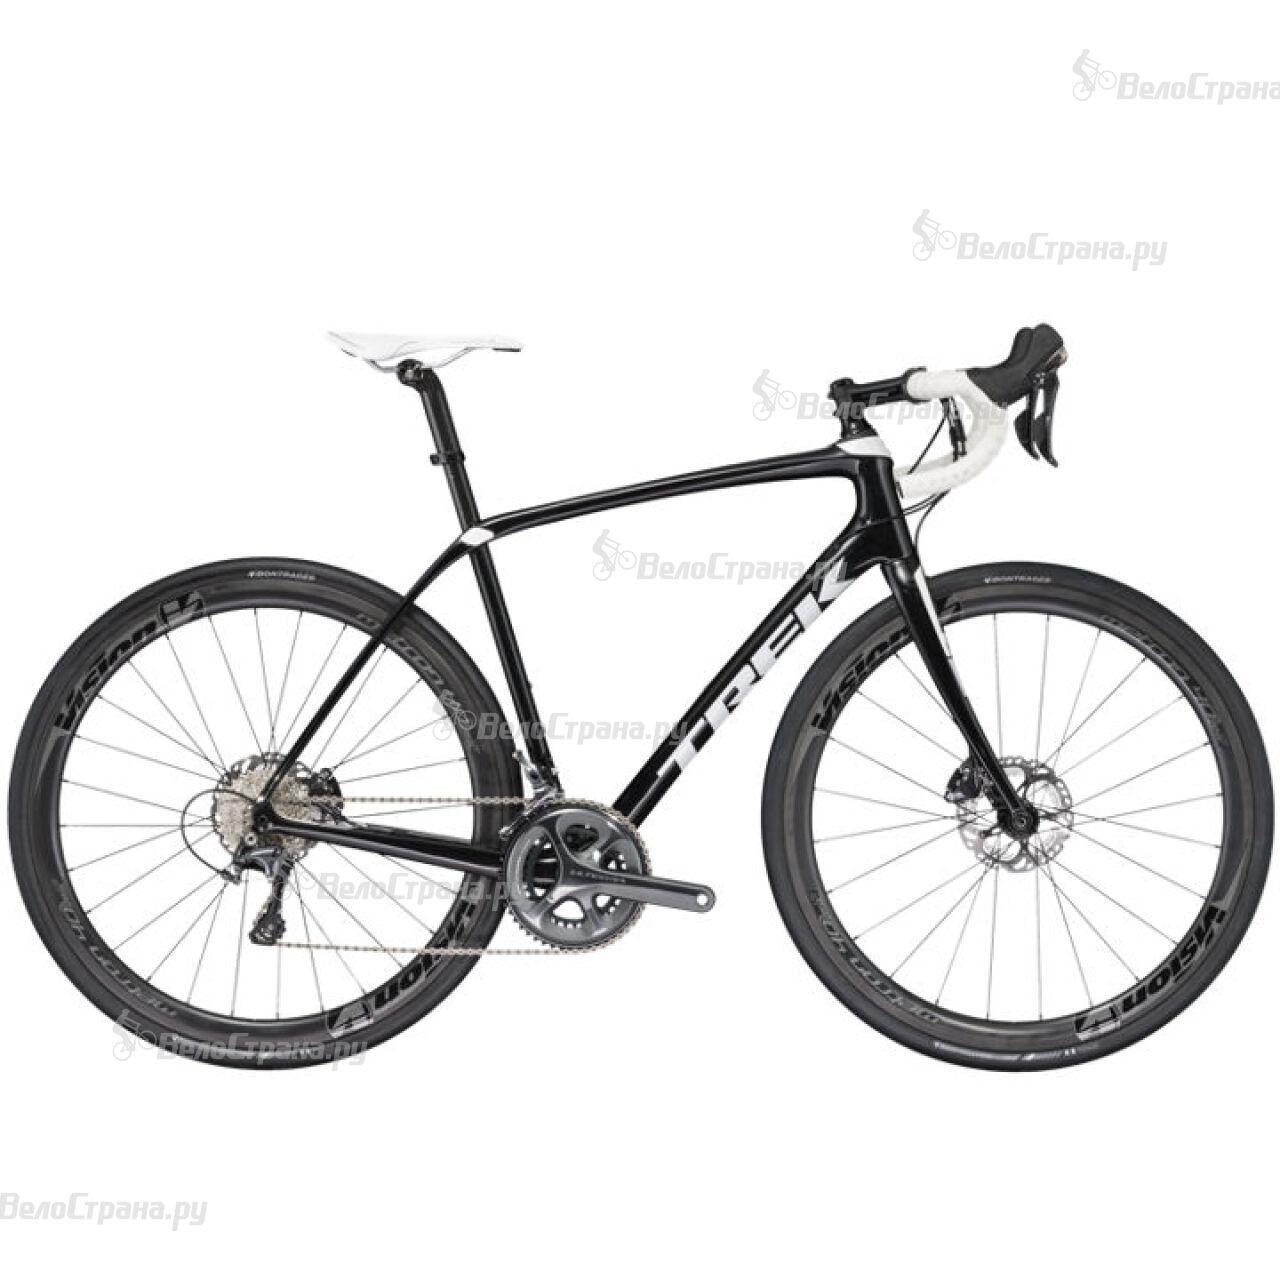 Велосипед Trek Domane SL 6 Disc (2017) джинсы billabong джинсы slim outsider denim fw17